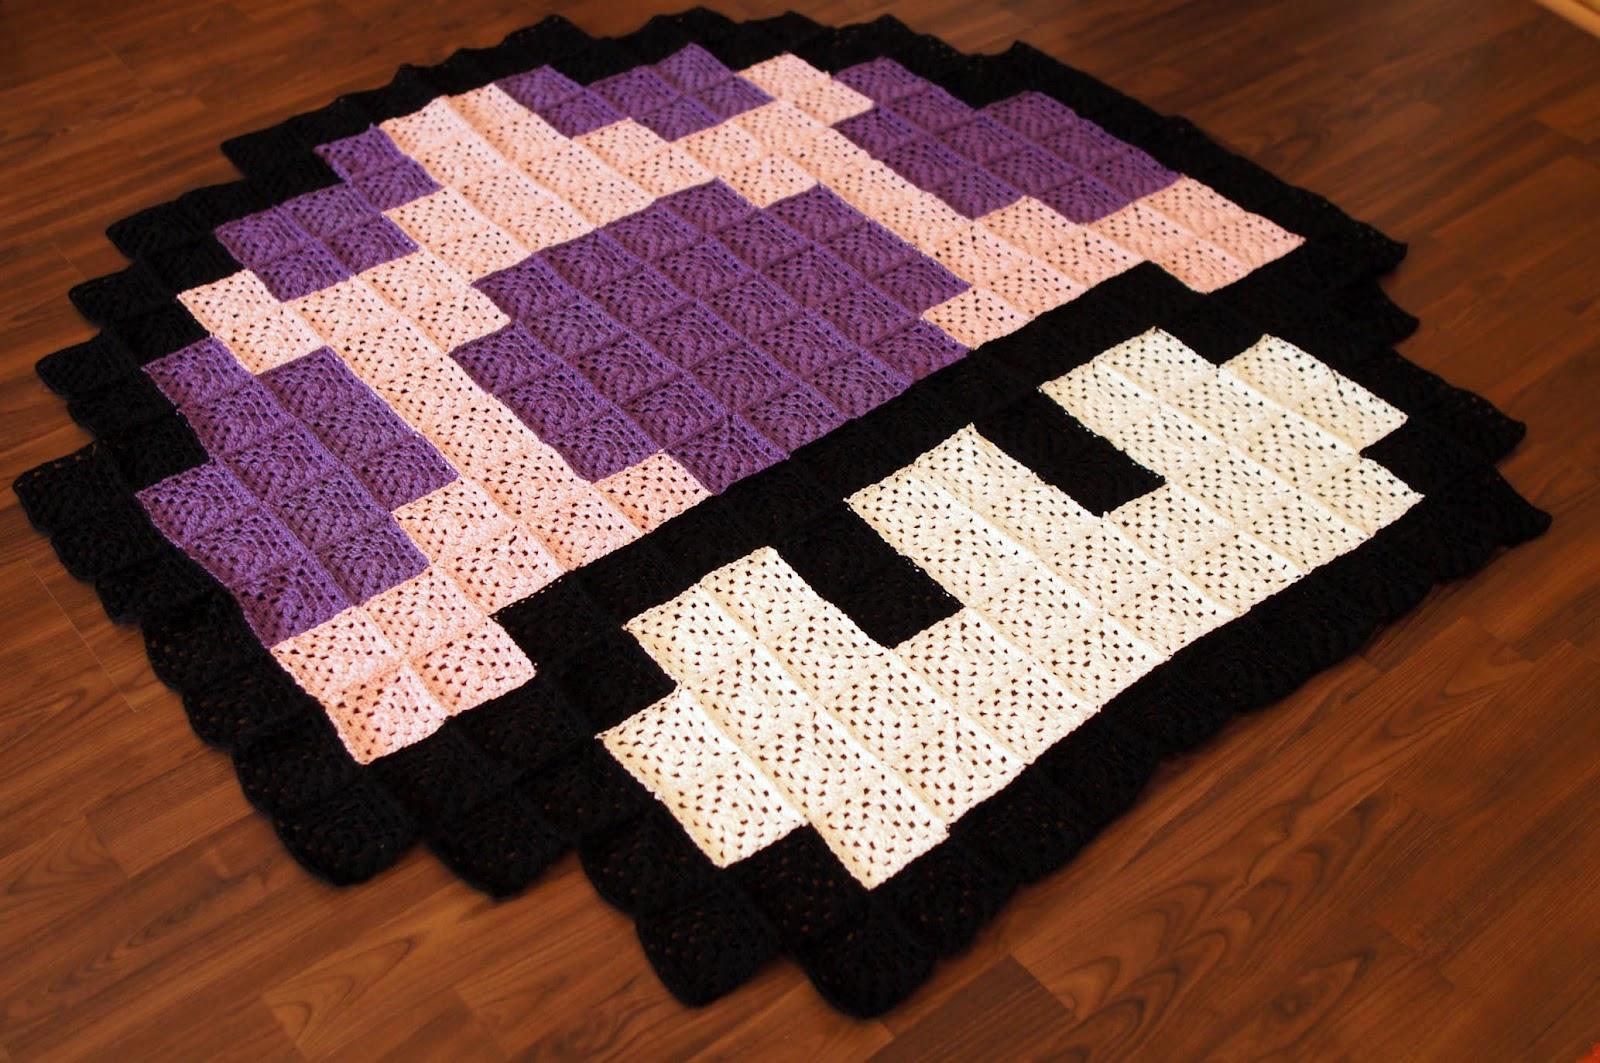 crochet knitting stitch granny square decke mushroom. Black Bedroom Furniture Sets. Home Design Ideas